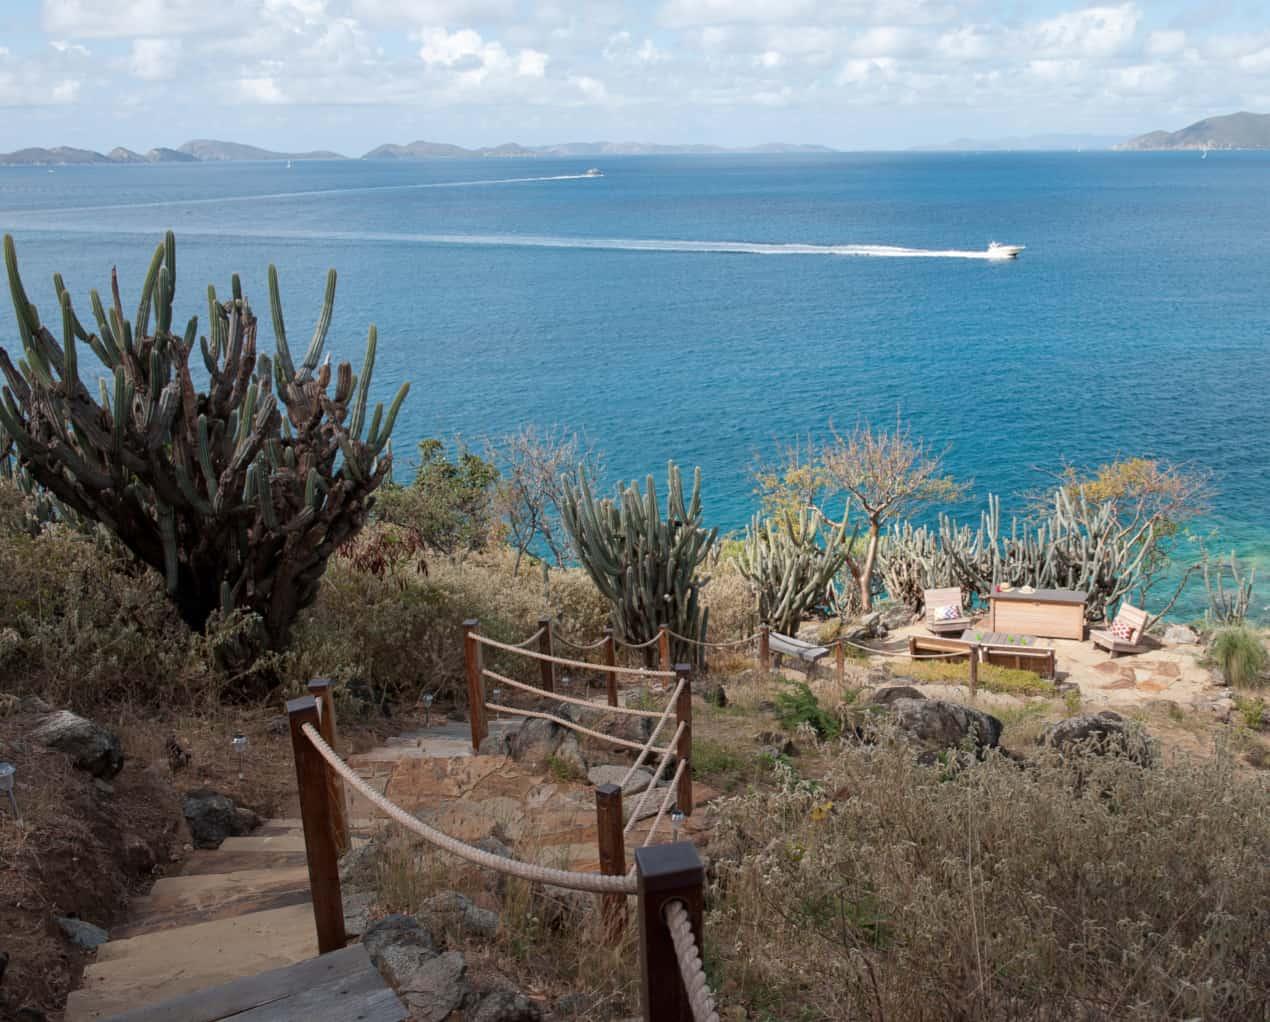 JMMDS_British-Virgin-Islands-landscape_rope-railing-seaside-terrace